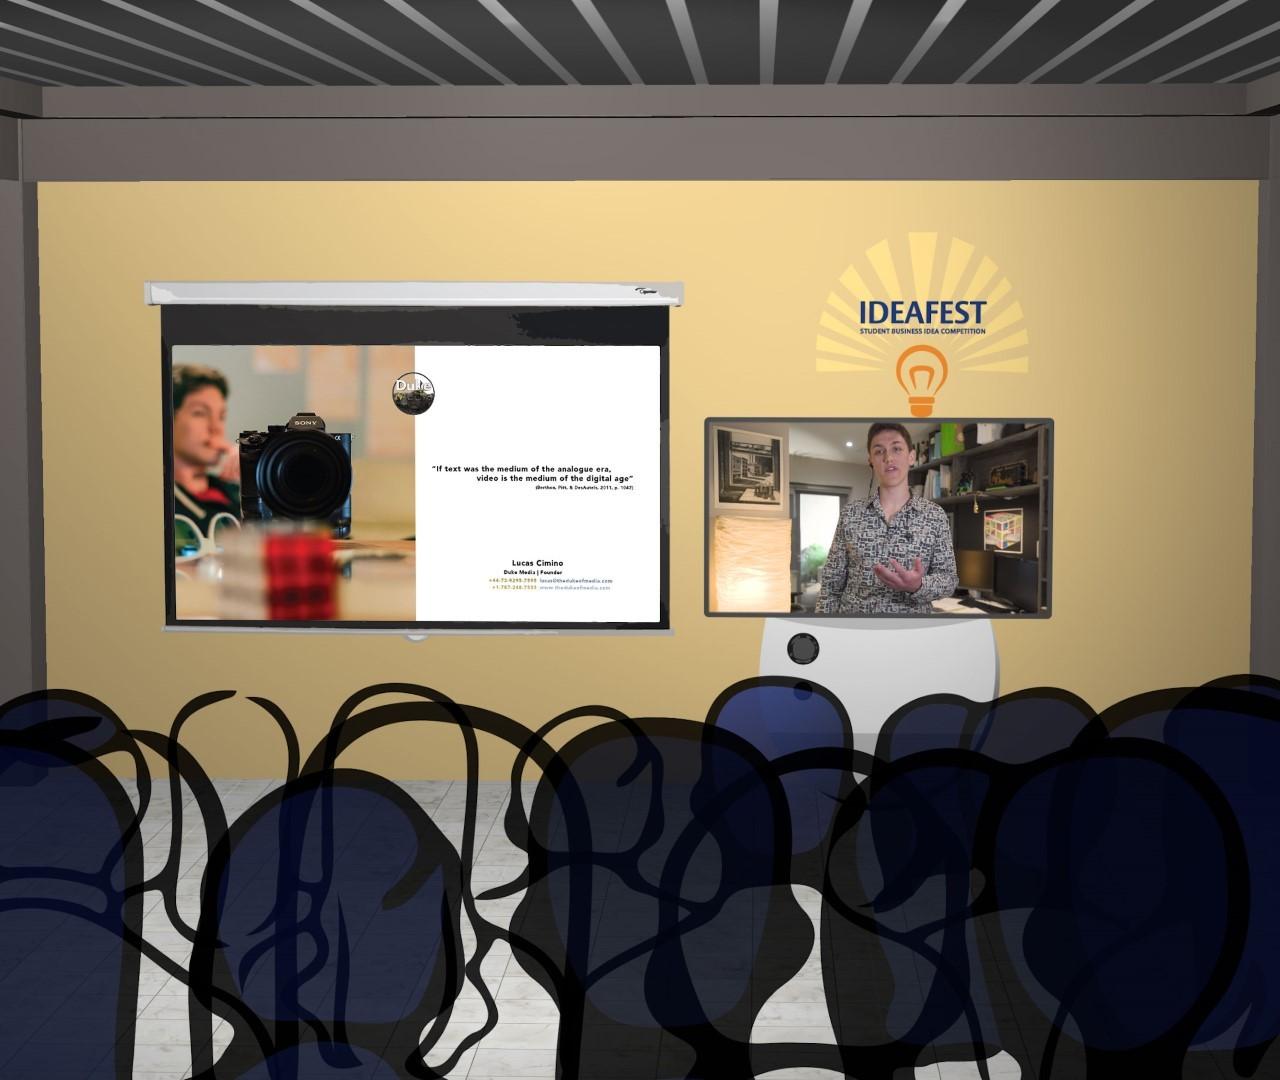 IDEAFEST-2020-Presentation-3.jpg?mtime=20200515195401#asset:134904